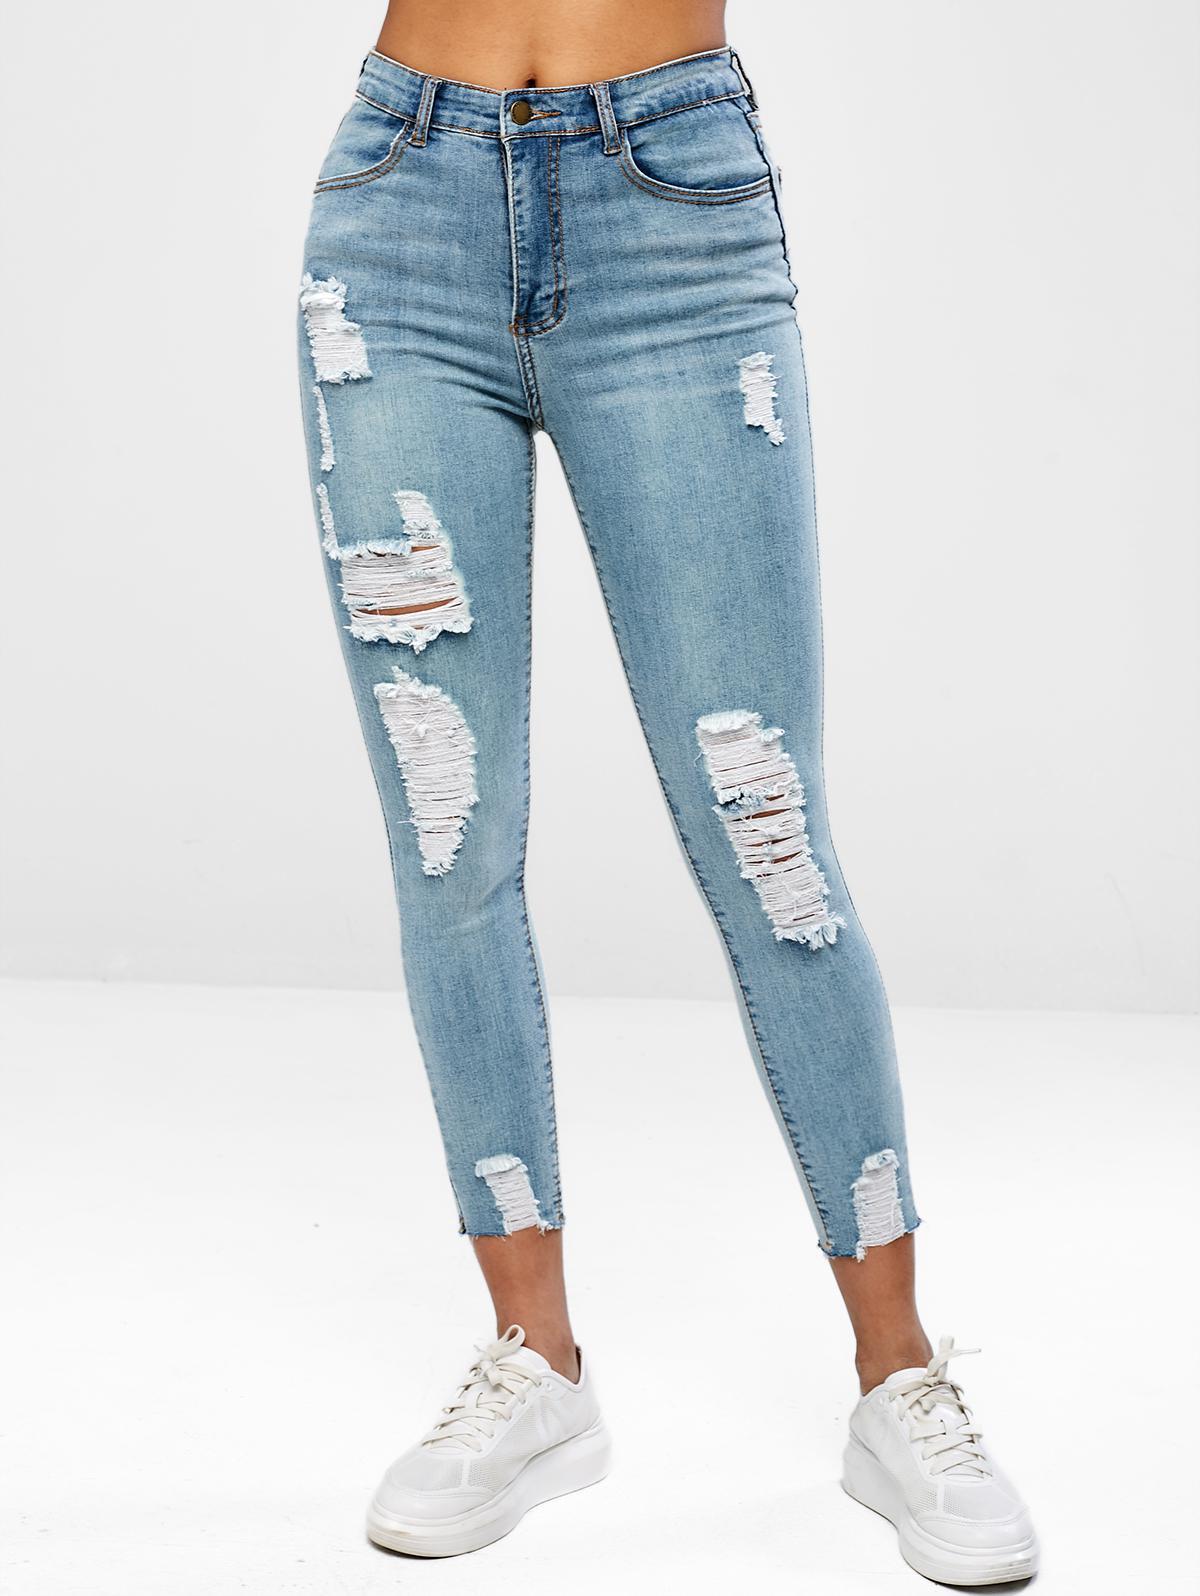 Zaful coupon: Ripped Raw Hem Jeans